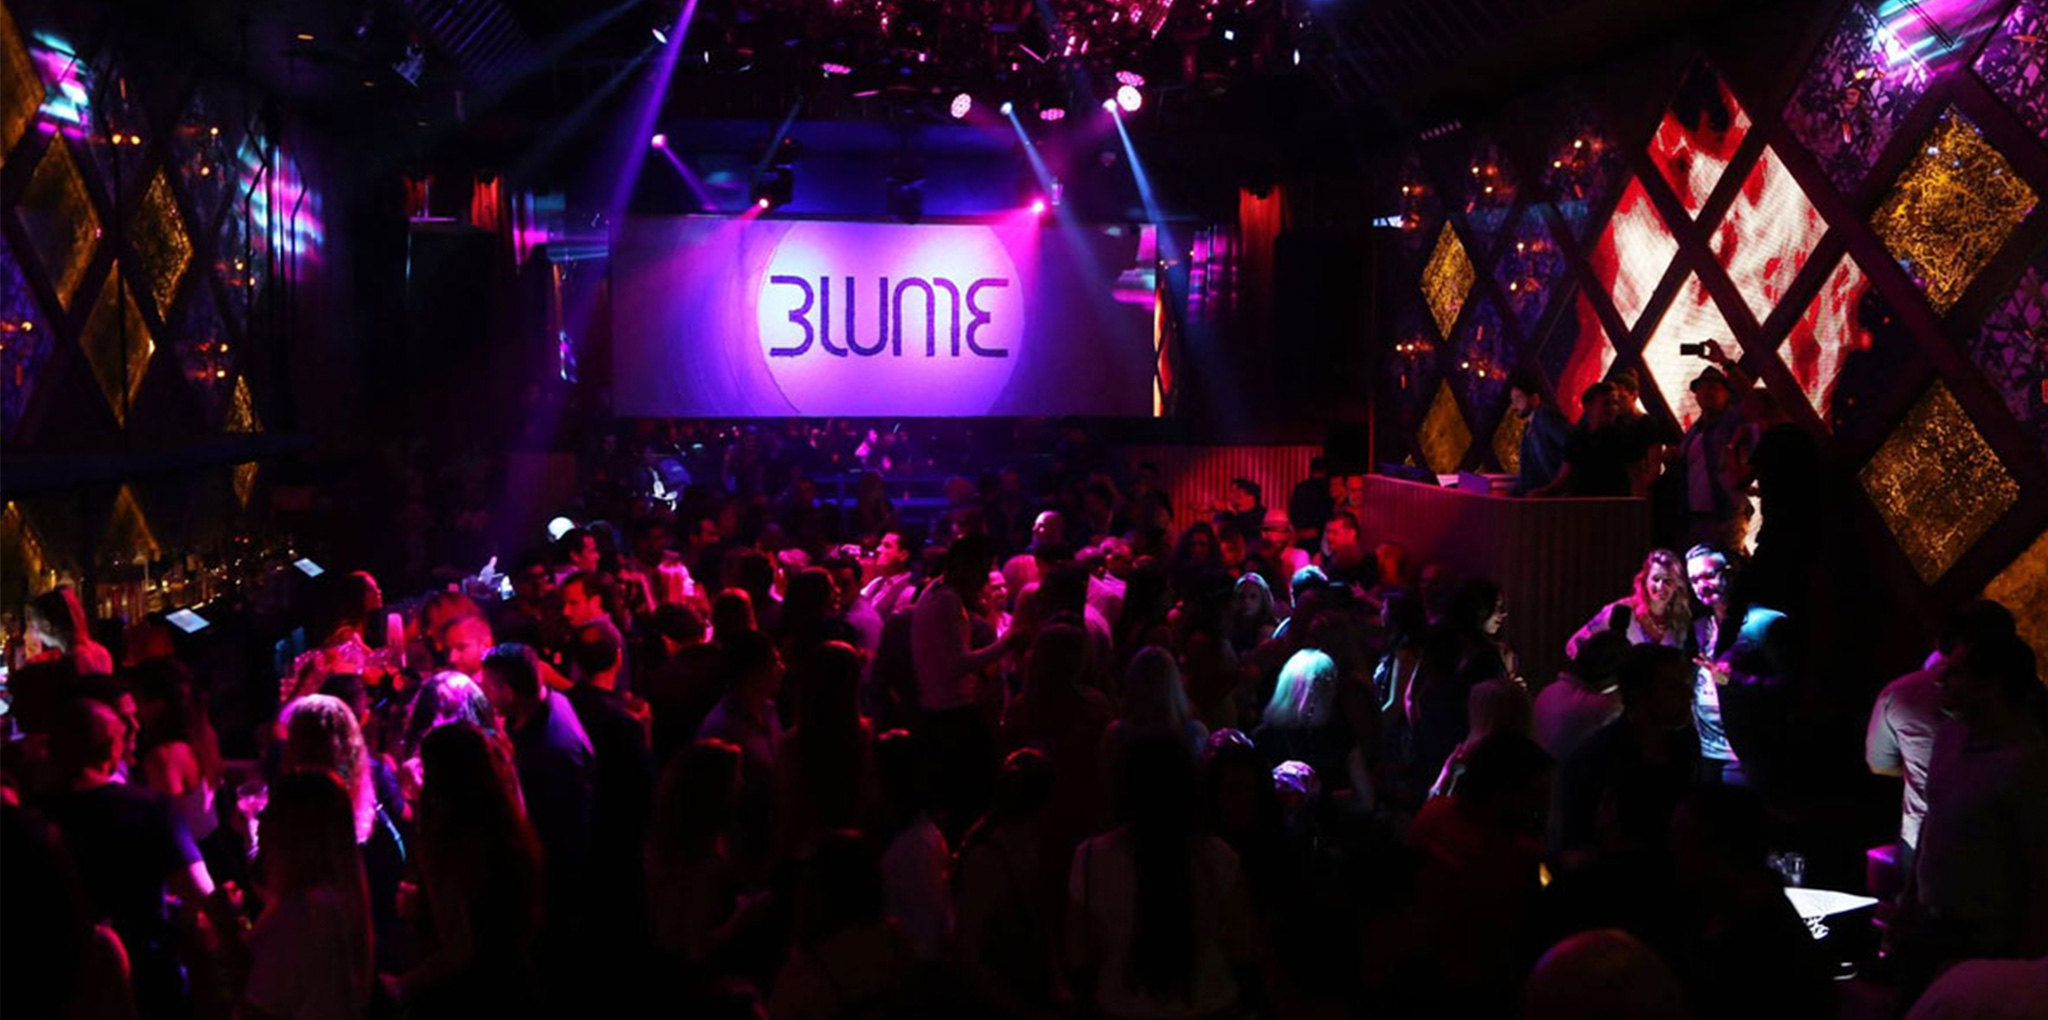 Blume Nightclub Image